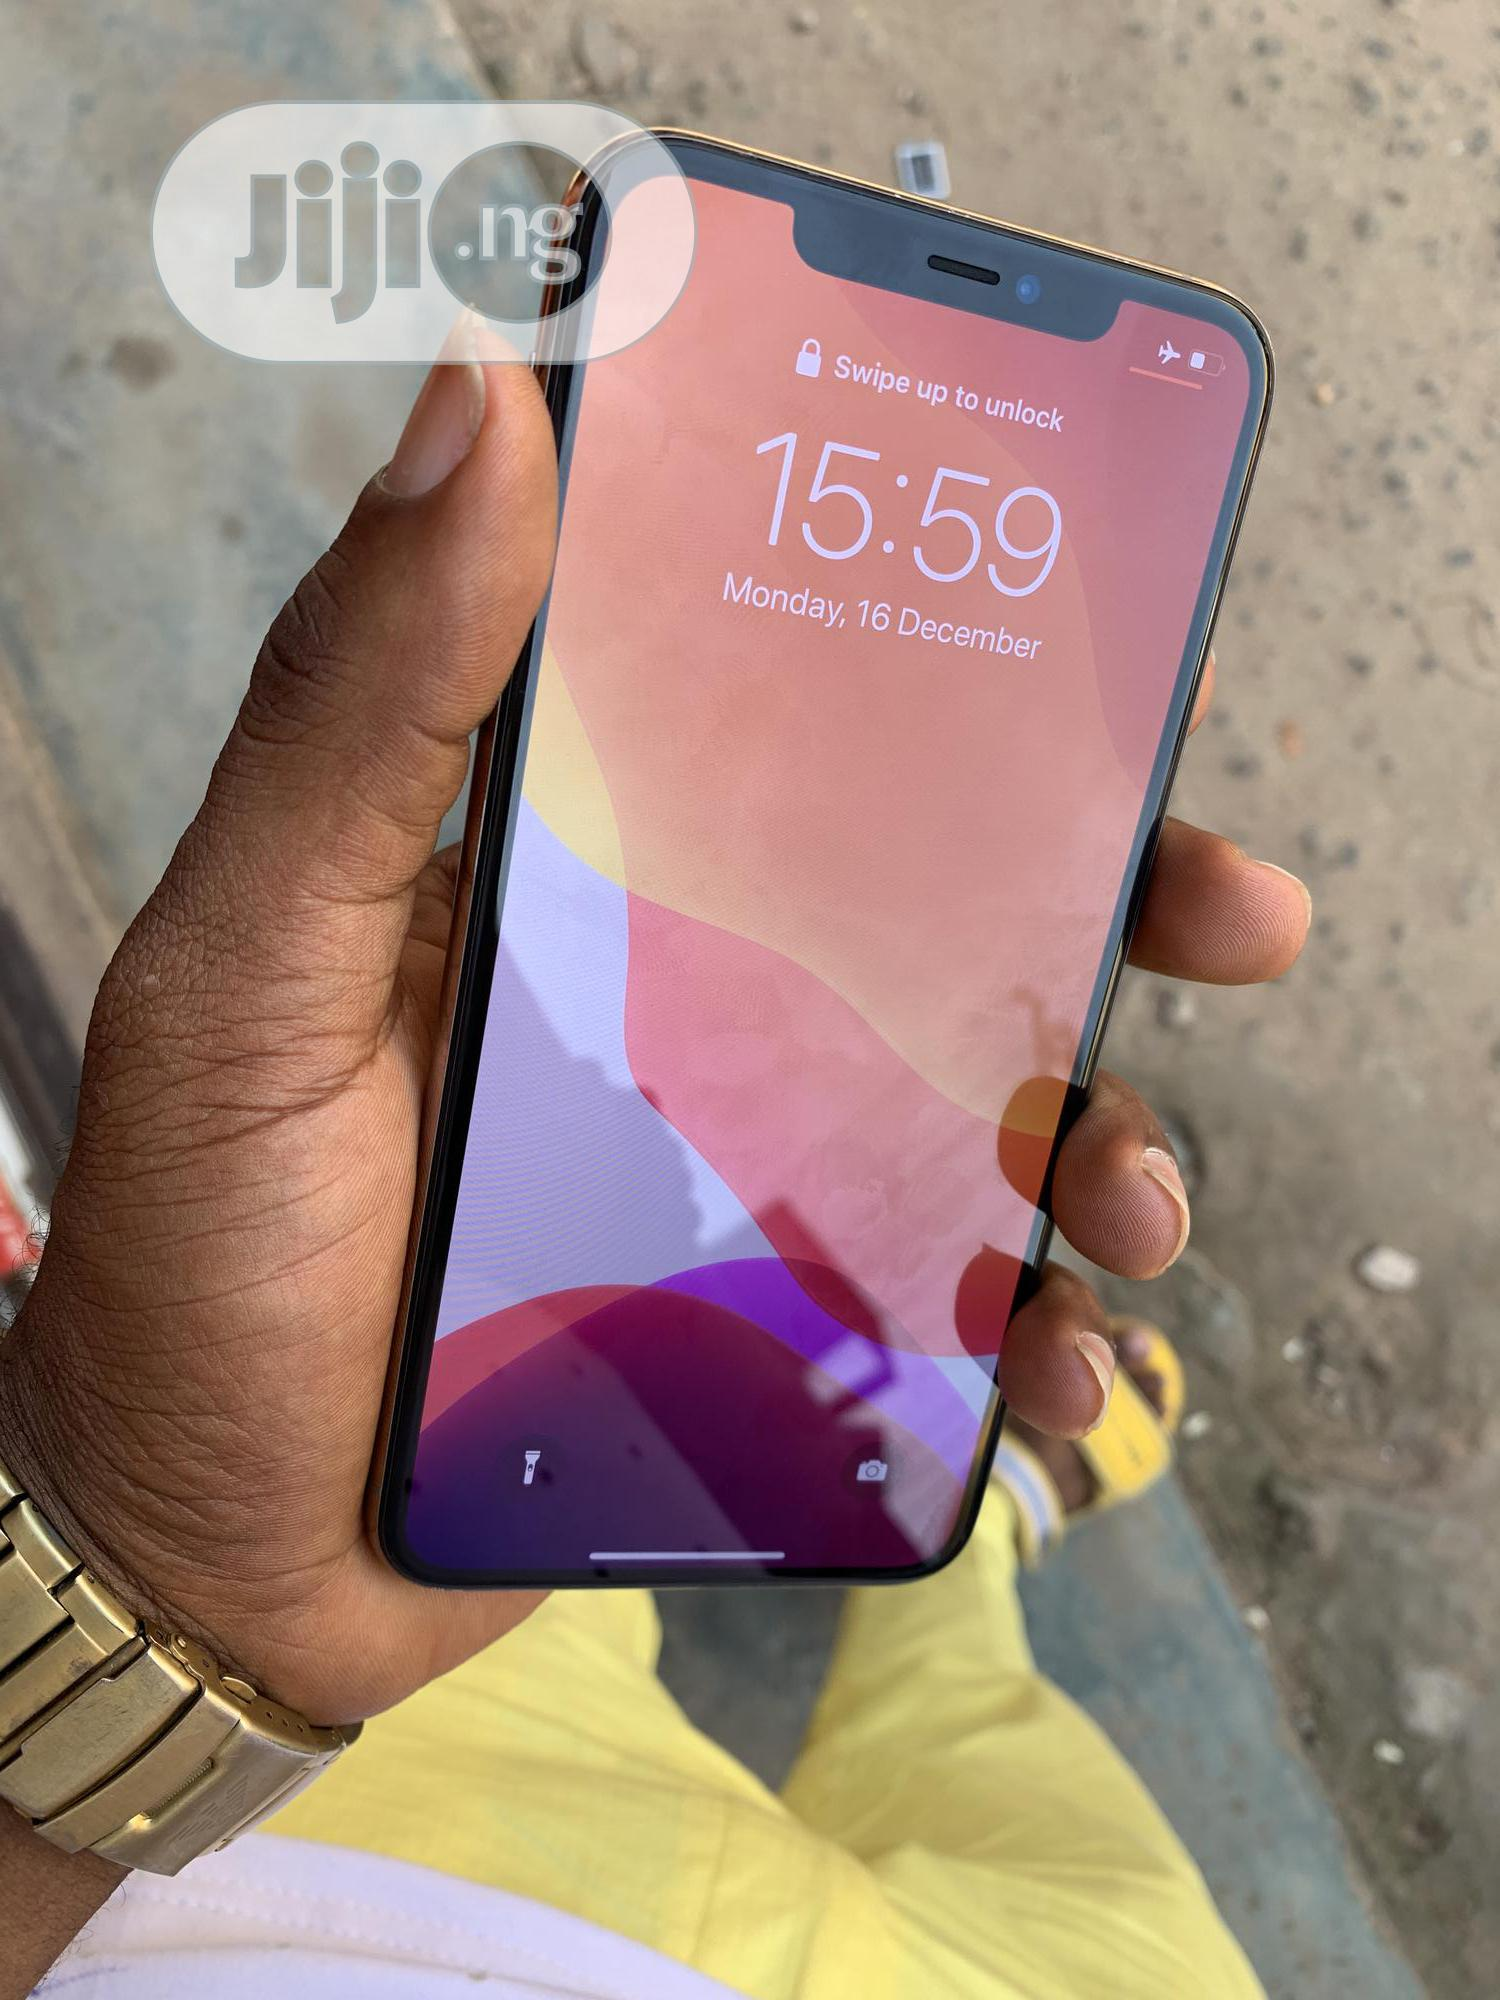 Apple iPhone 11 Pro Max 256 GB Gold | Mobile Phones for sale in Benin City, Edo State, Nigeria